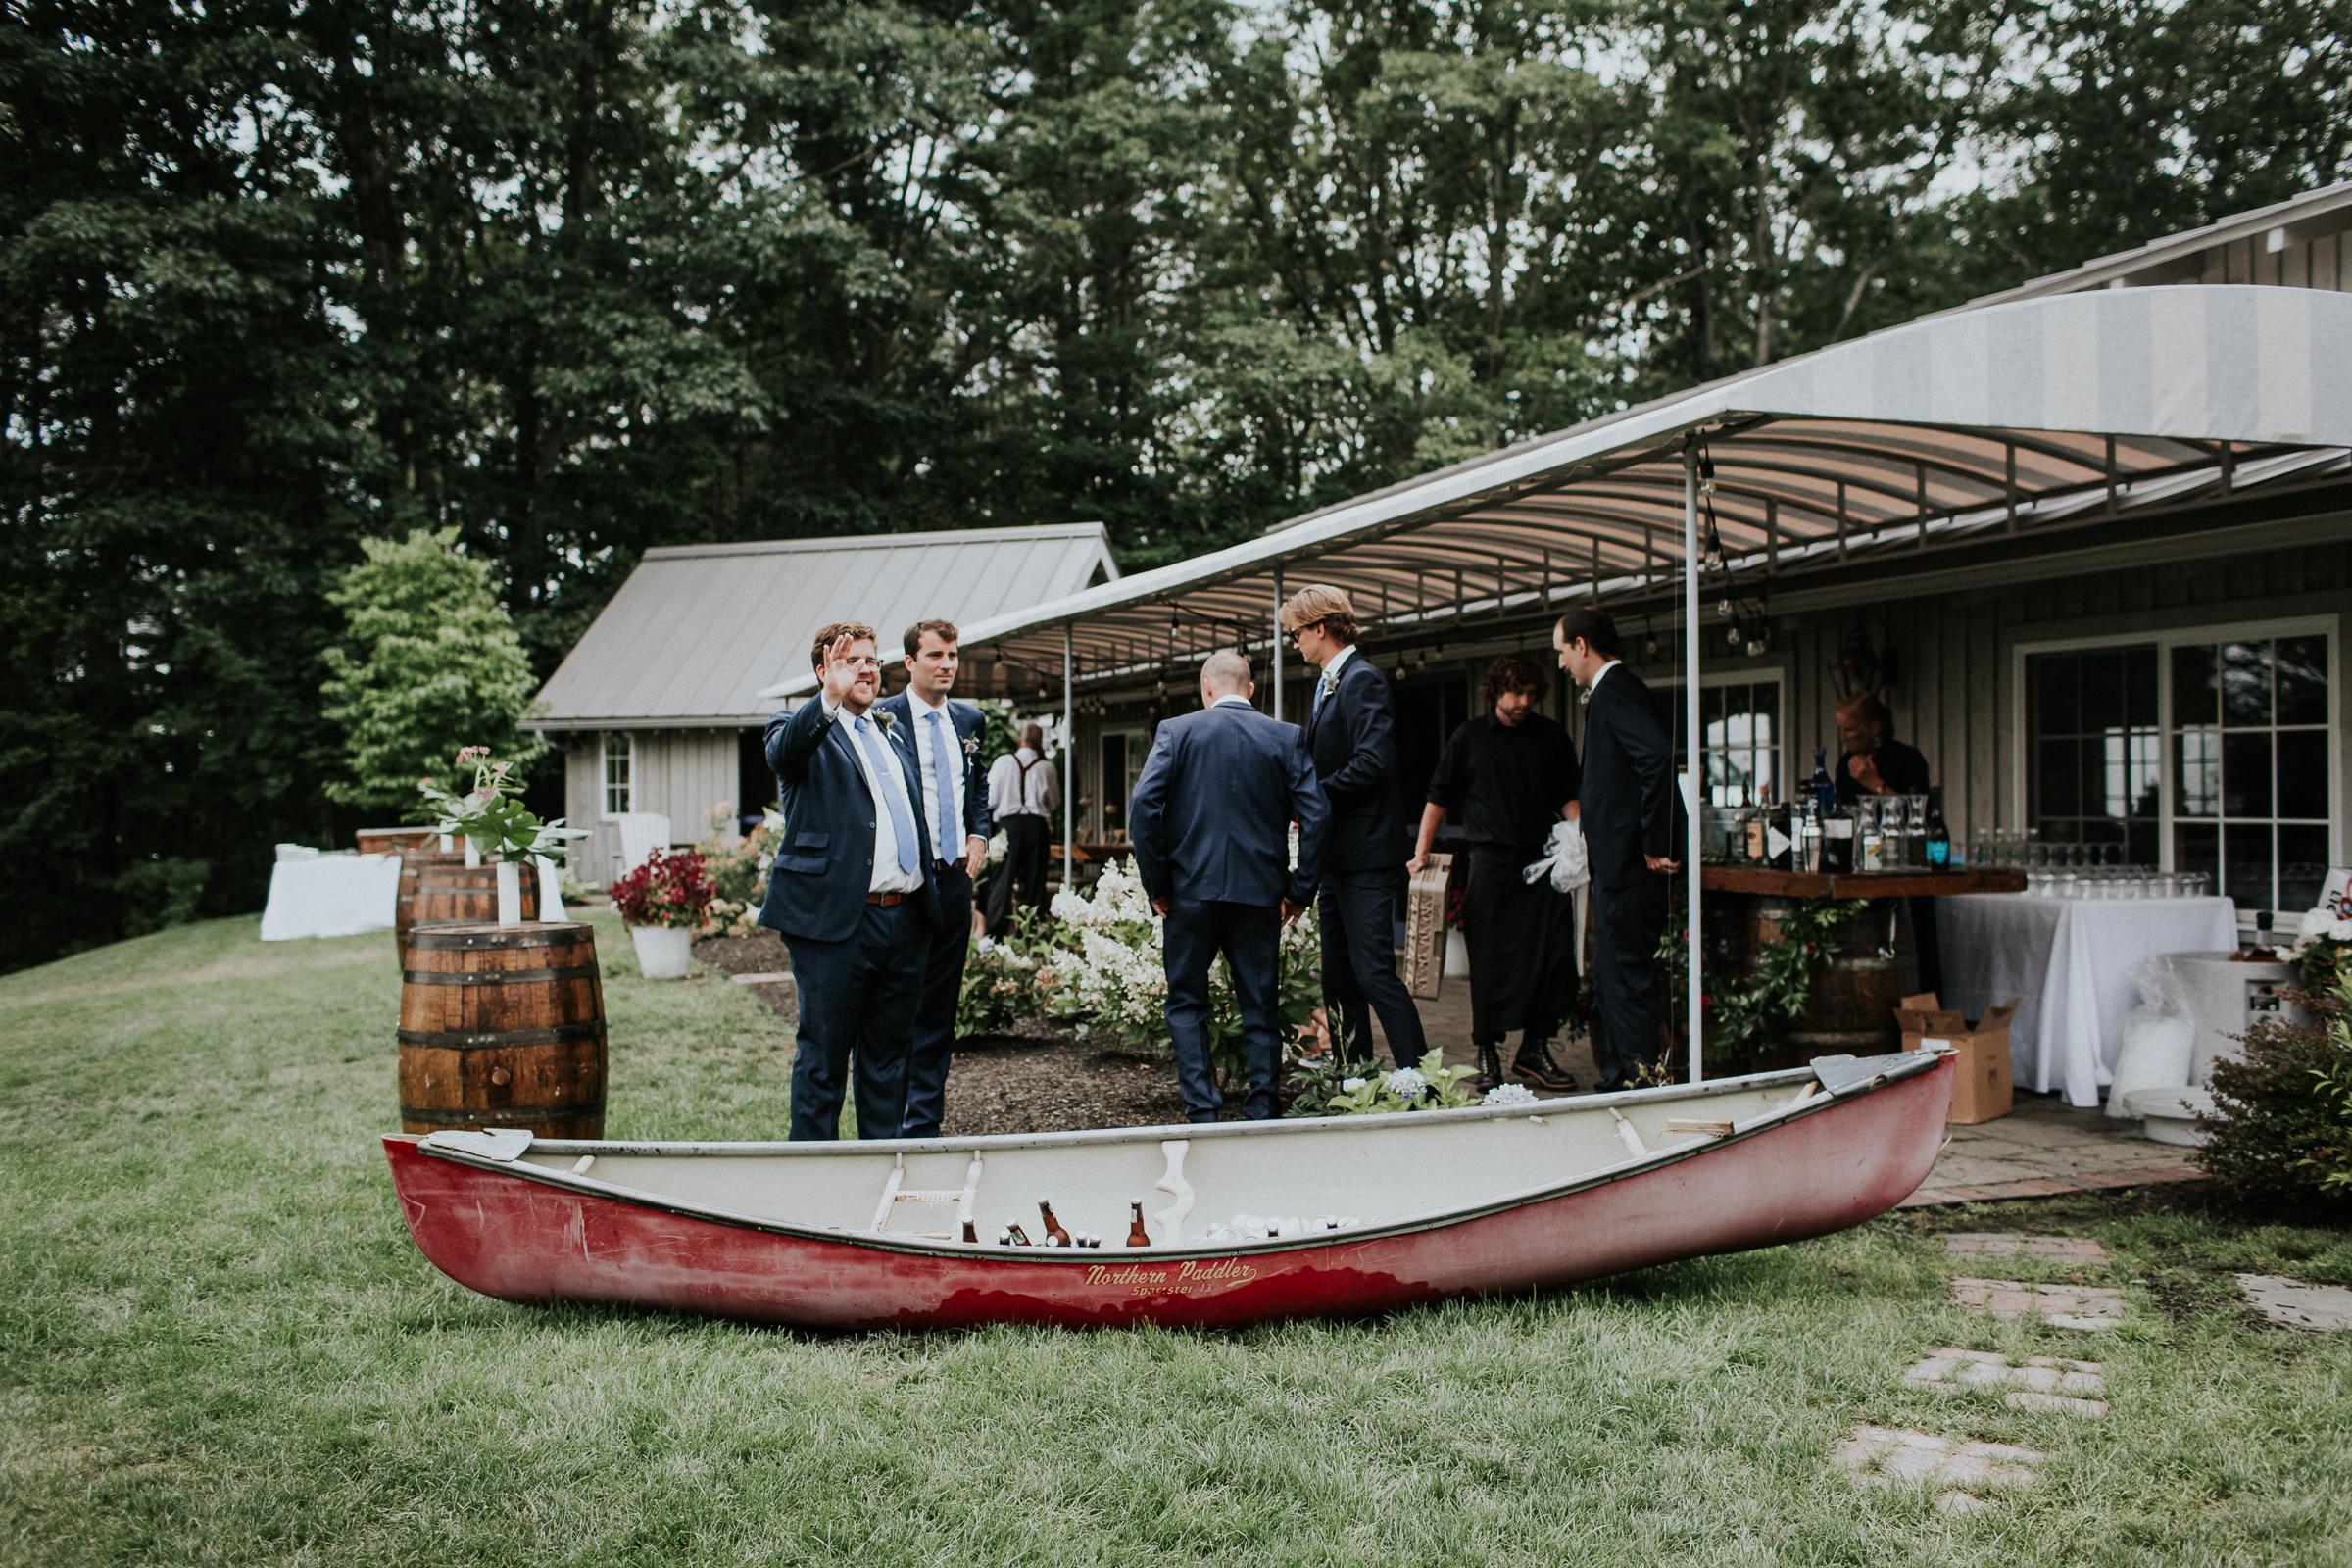 Marianmade-Farm-Wiscasset-Maine-Fine-Art-Documentary-Wedding-Photographer-Elvira-Kalviste-Photography-52.jpg